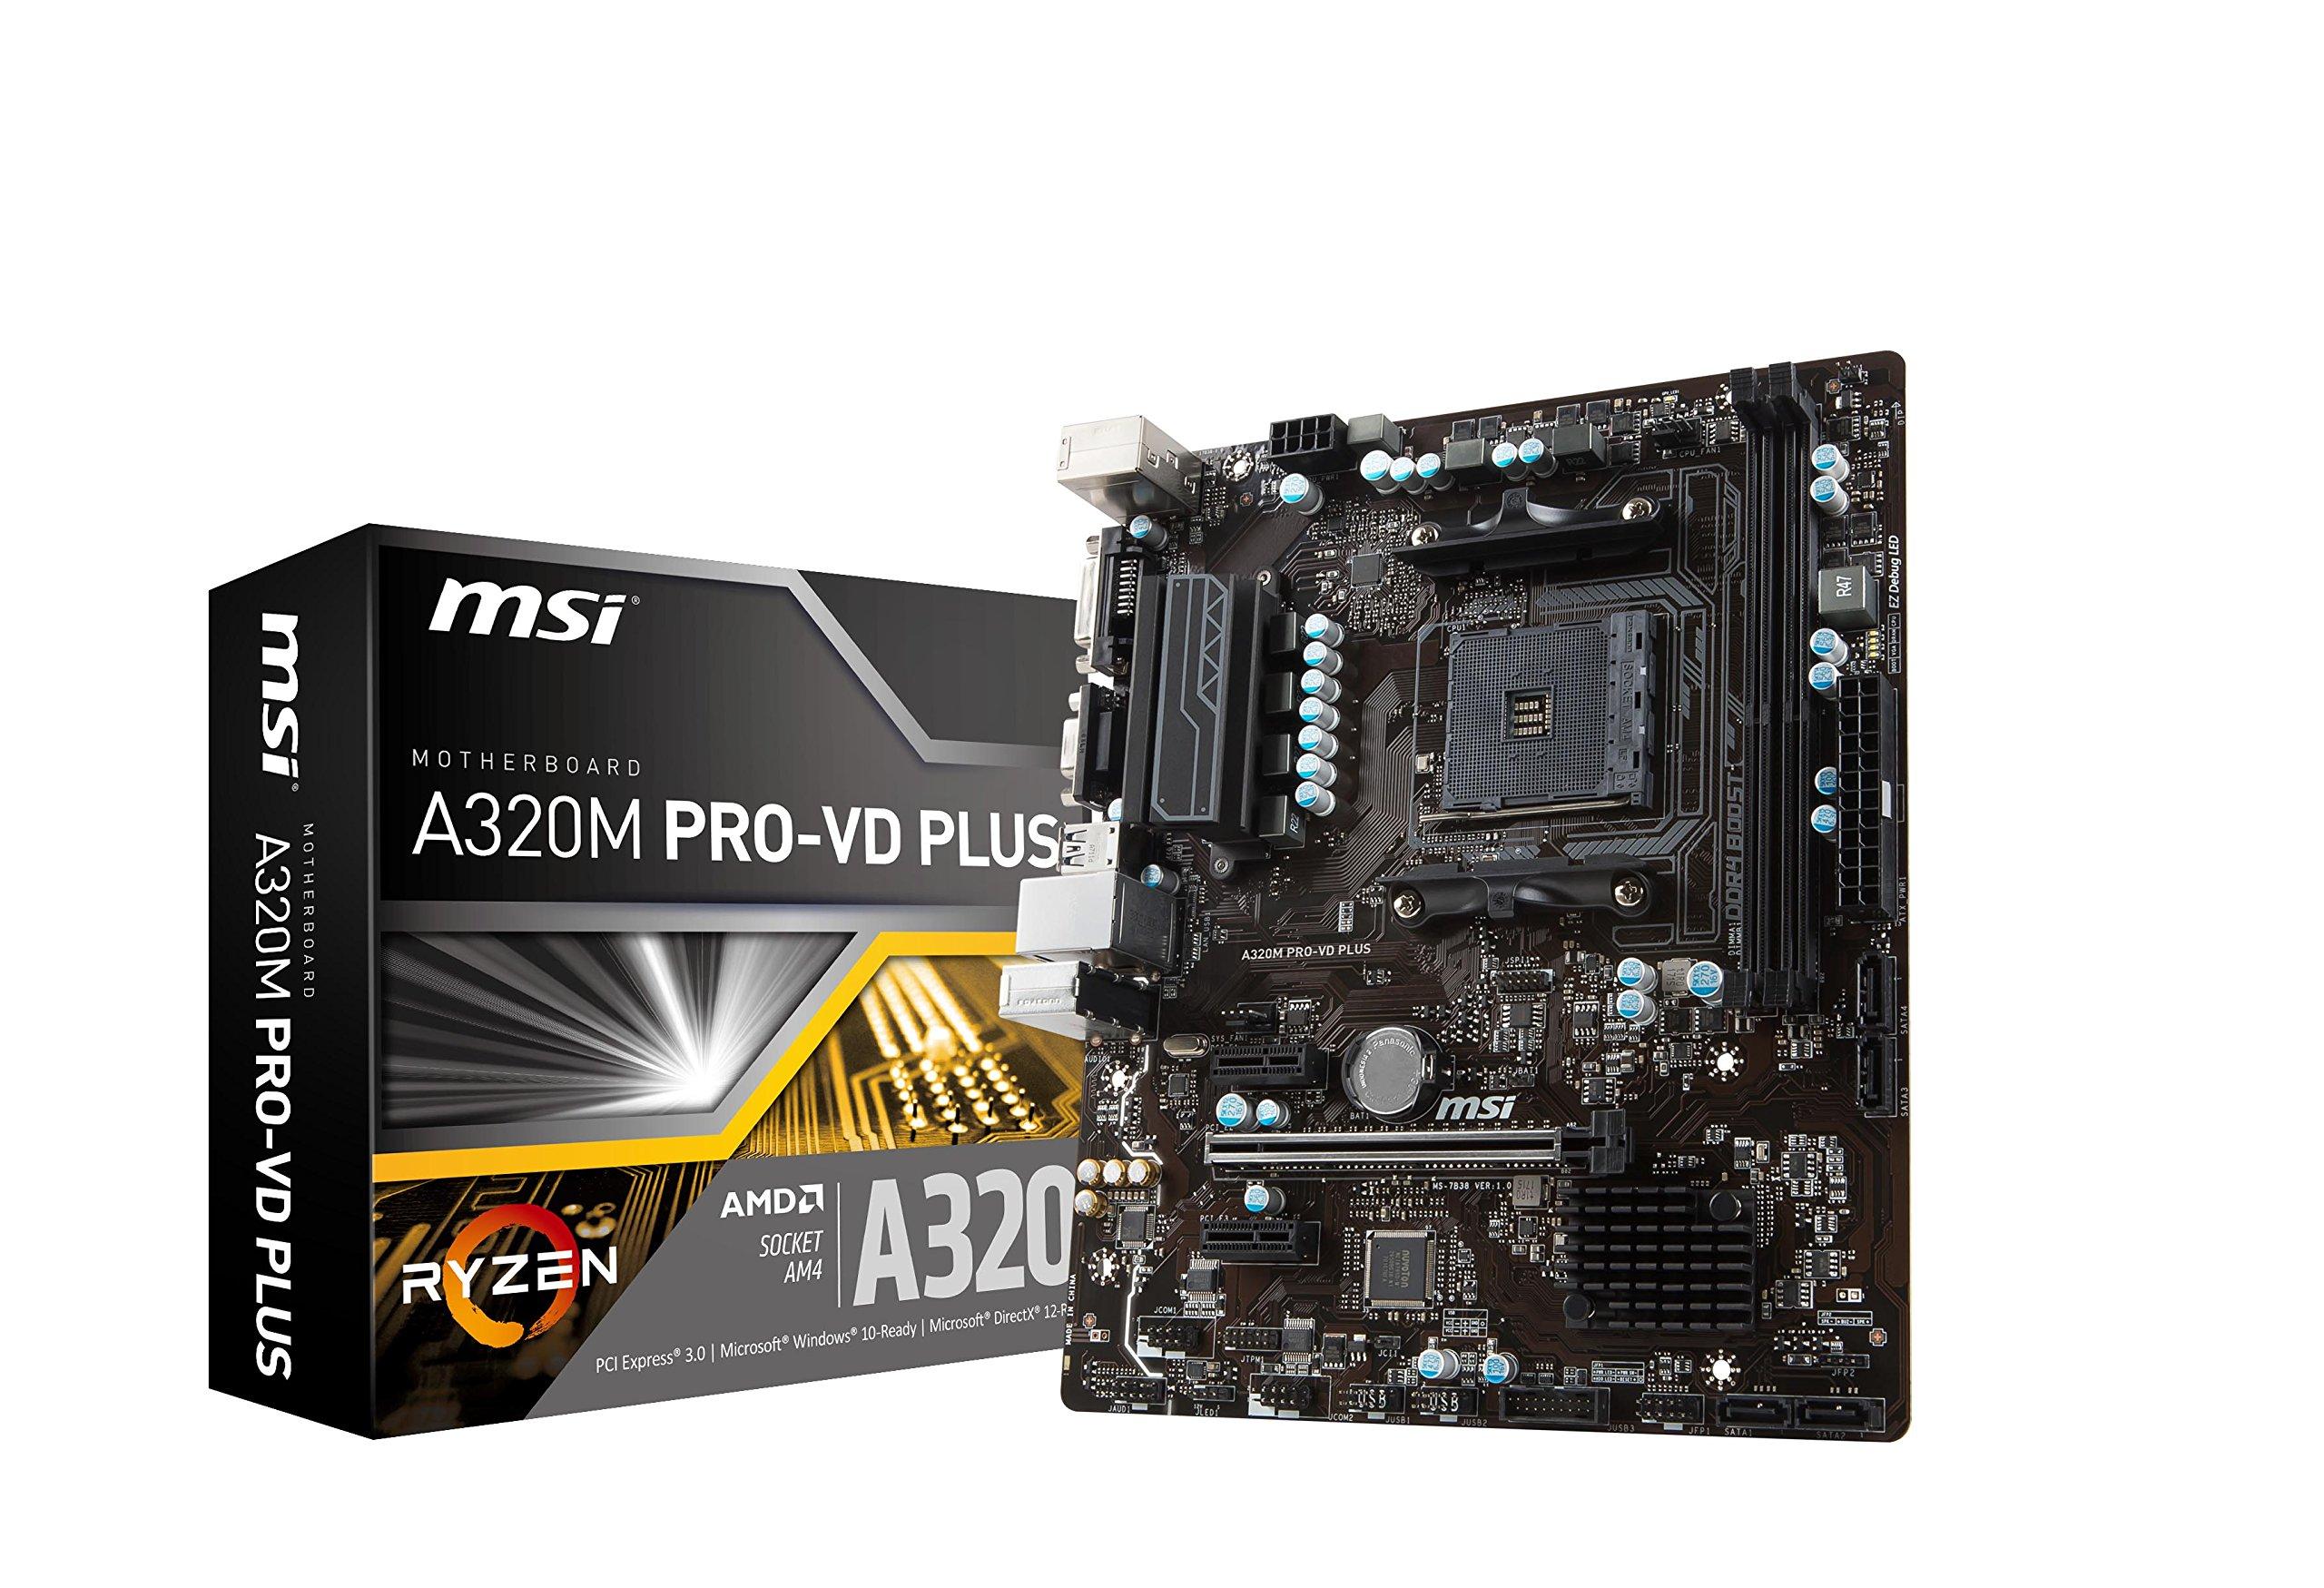 MSI ProSeries AMD Ryzen A320 DDR4 VR Ready USB 3 micro-ATX Motherboard (A320M PRO-VD PLUS)